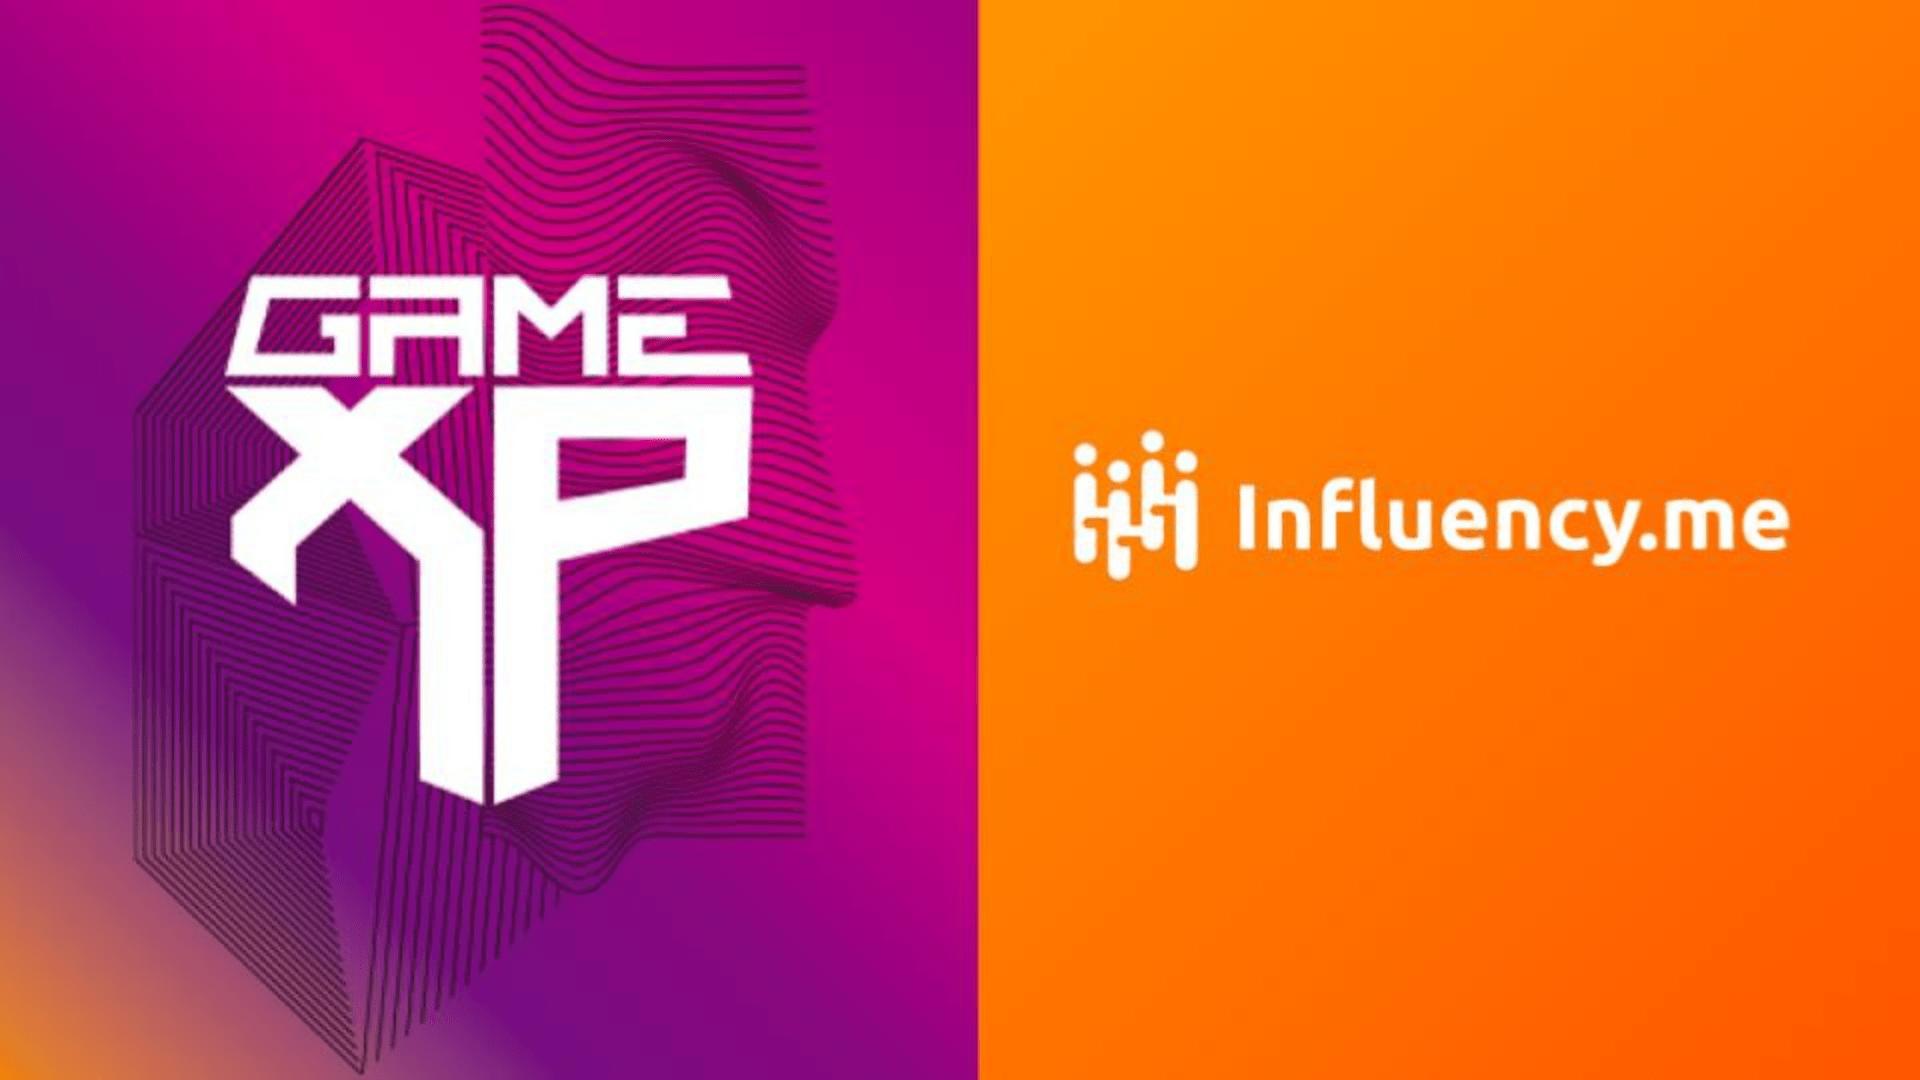 Influency.me e GameXP